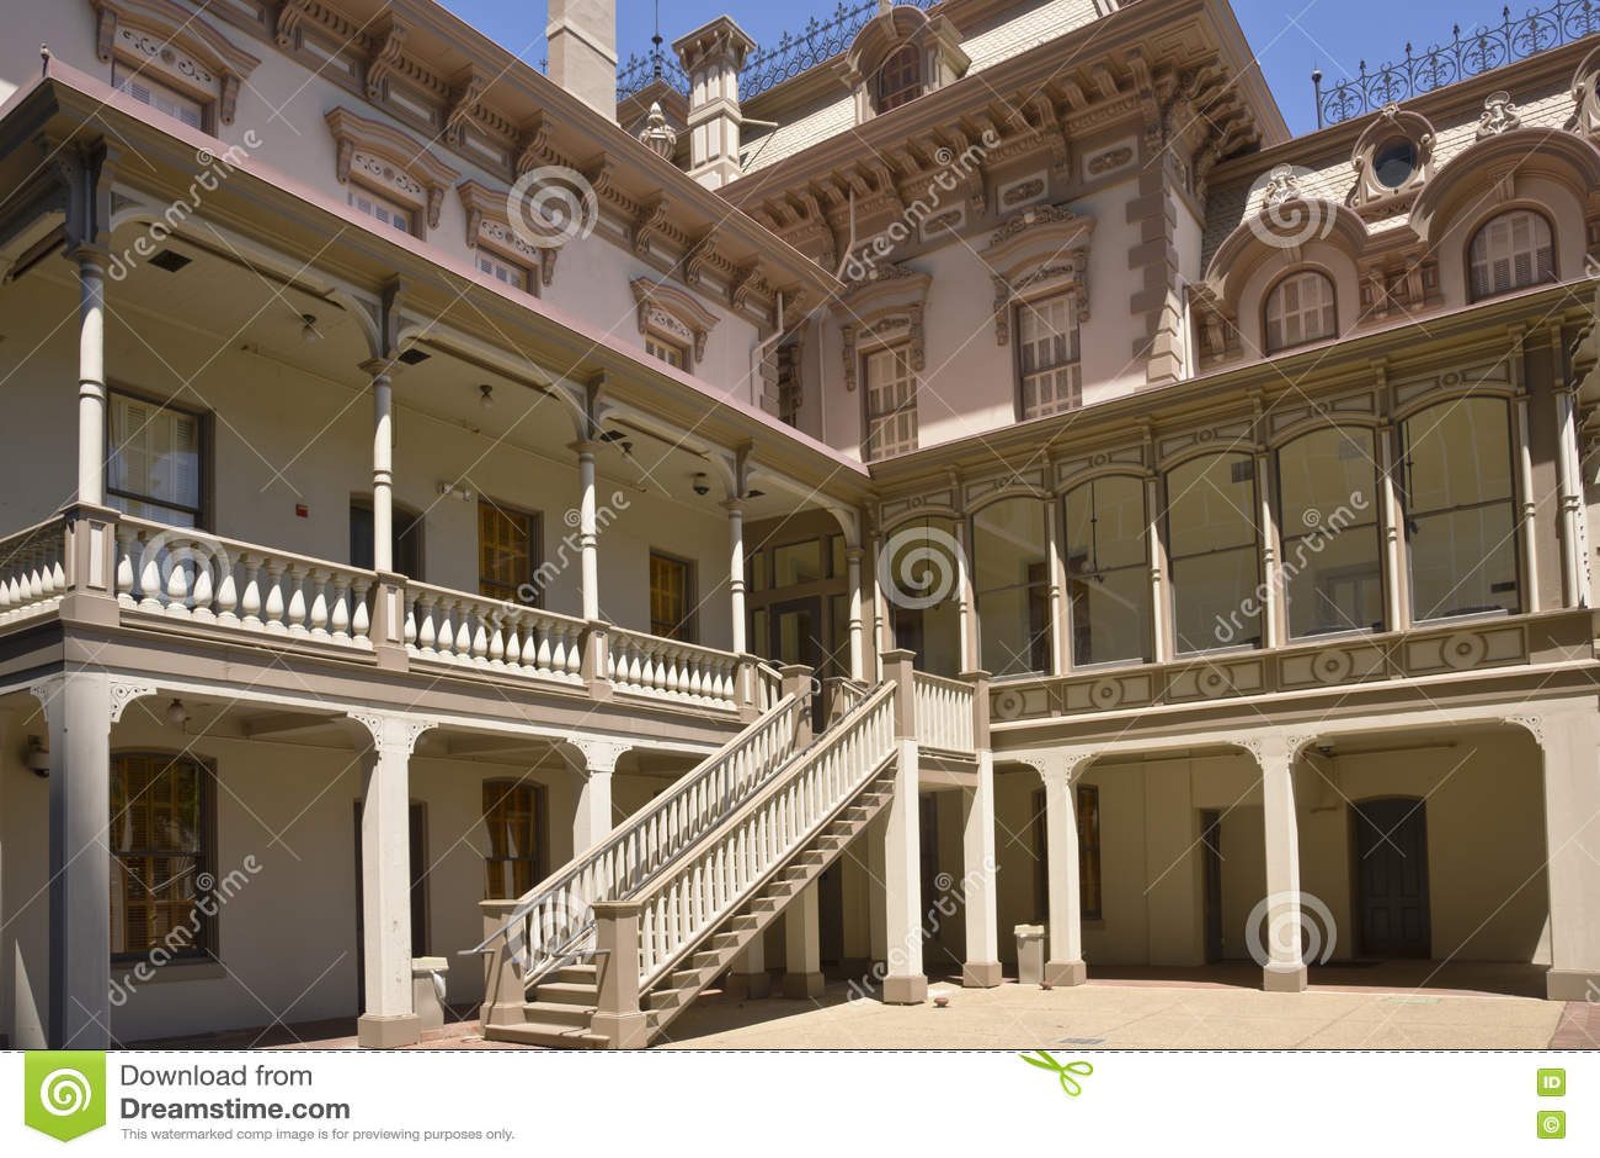 Historical house in Sacramento California. - Historical House In Sacramento California. Stock Image - Image Of